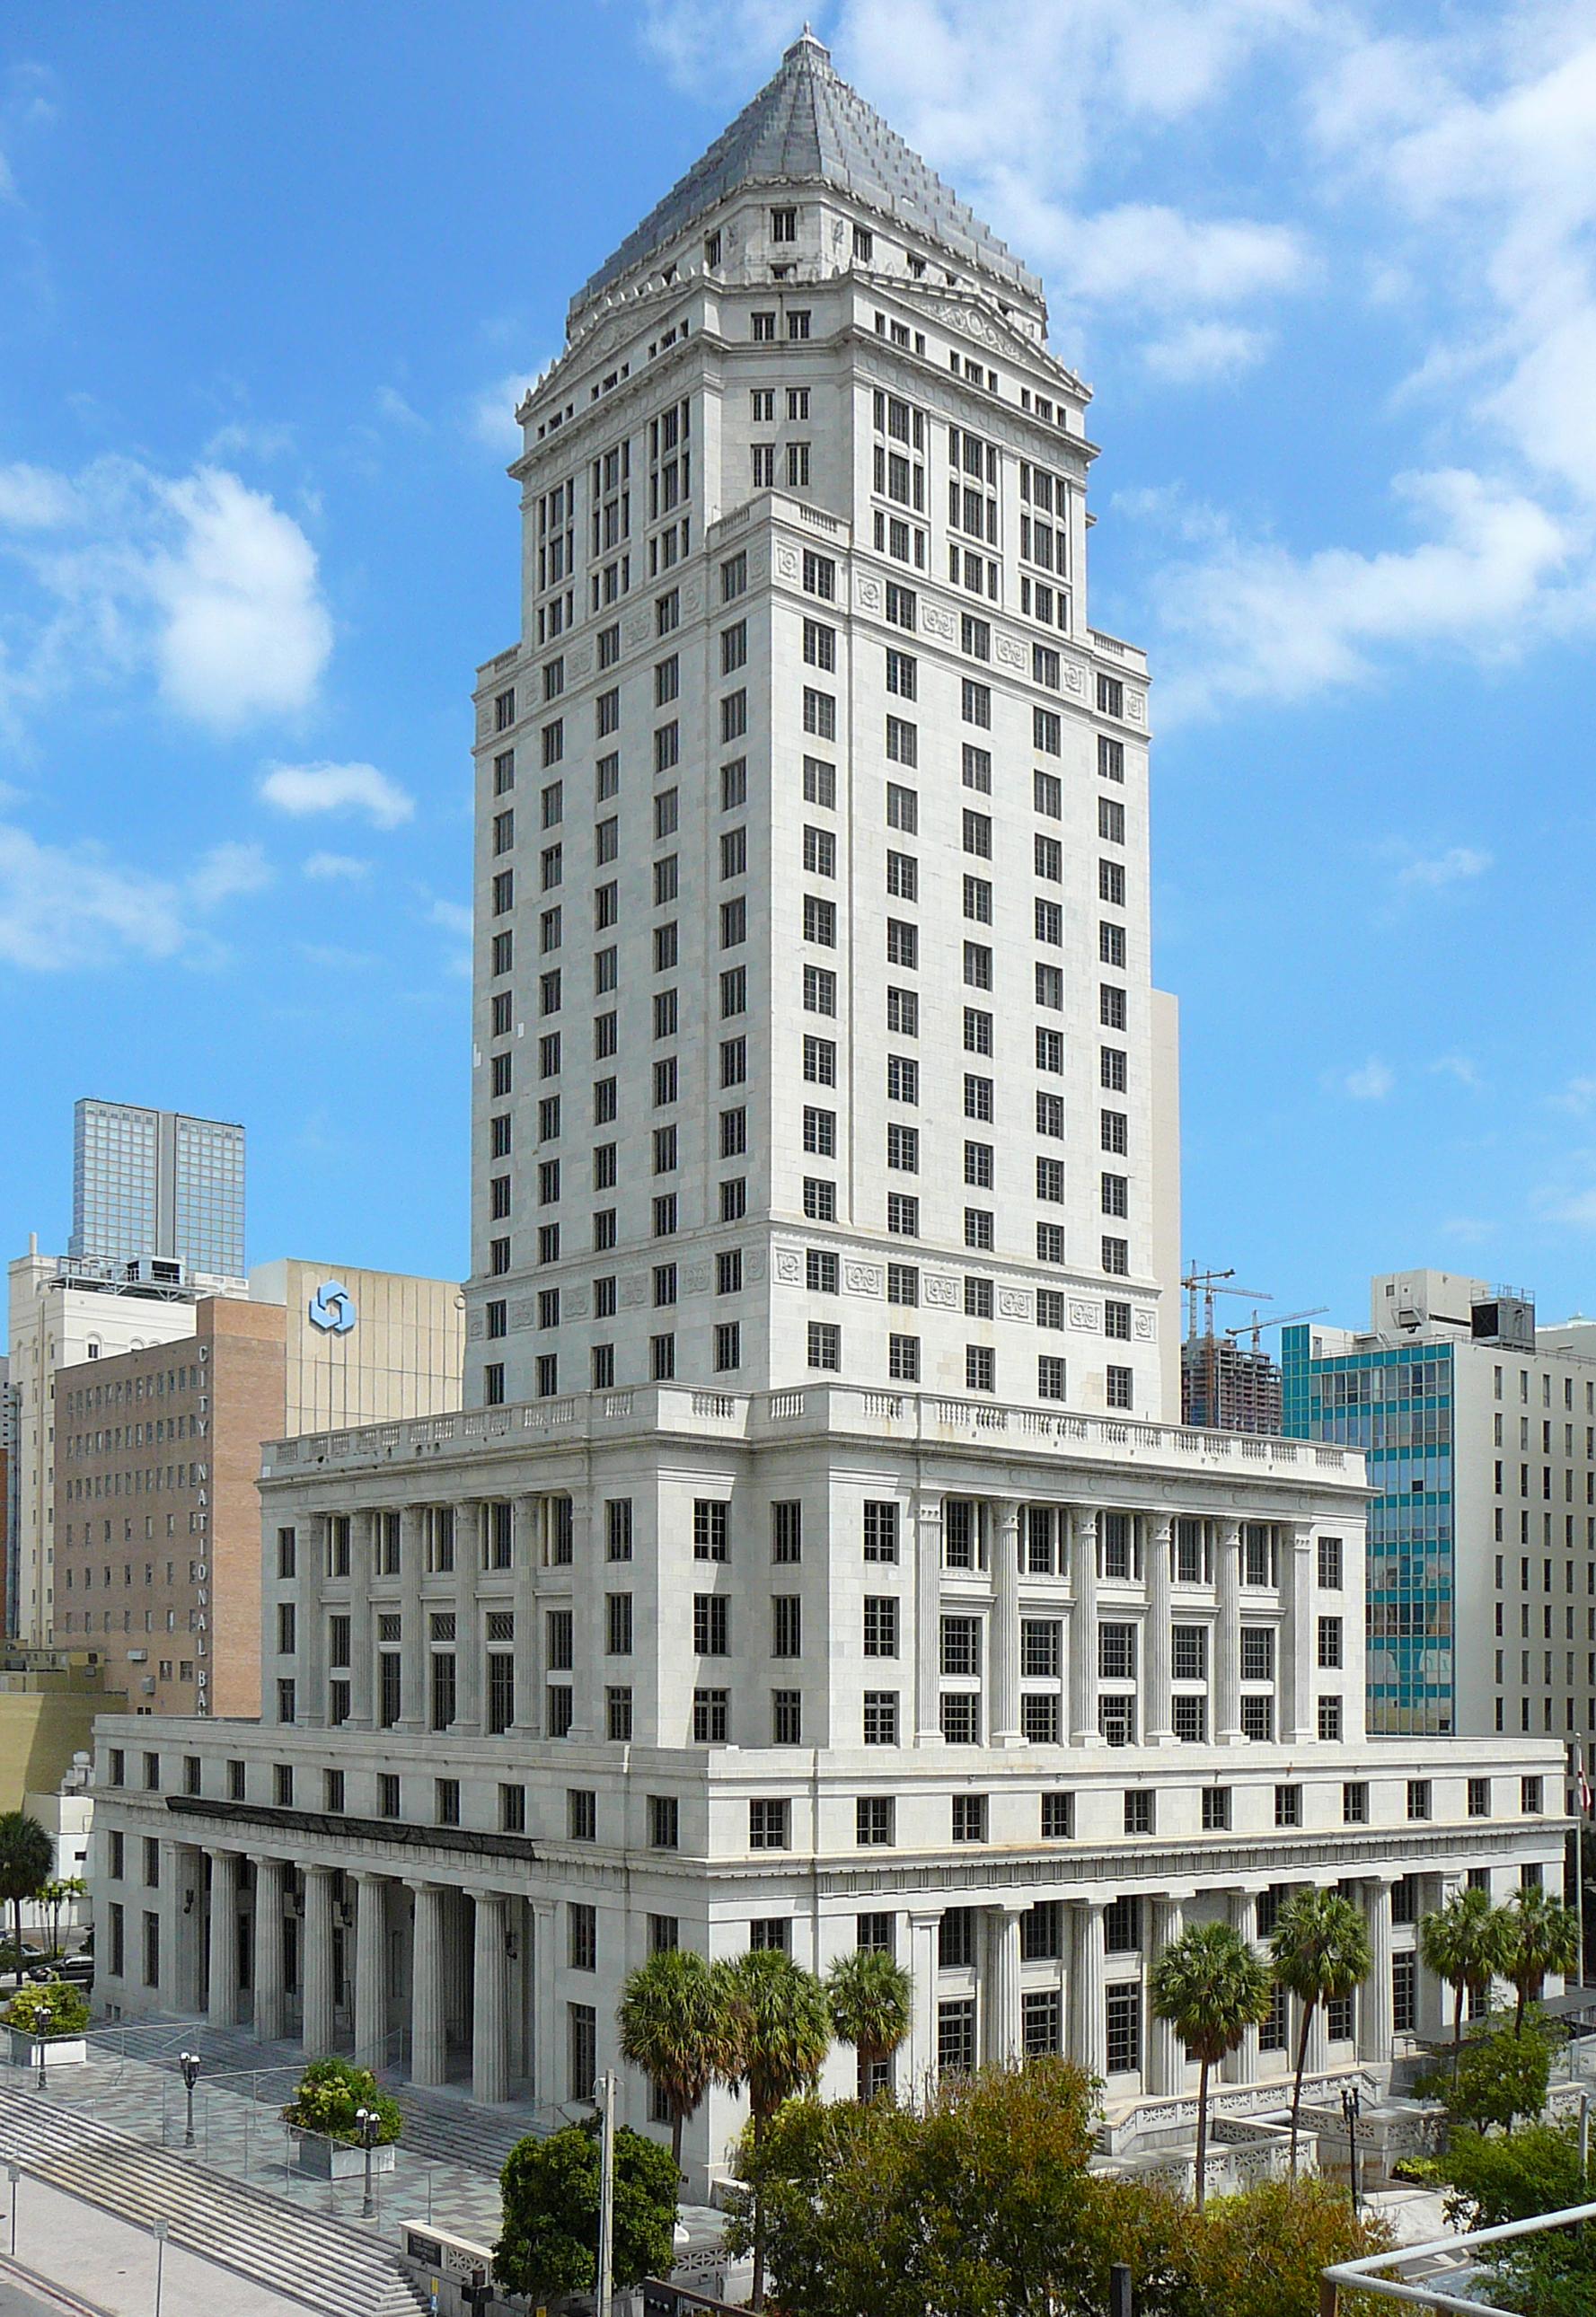 Park Miami Dade County Miami-dade County Courthouse